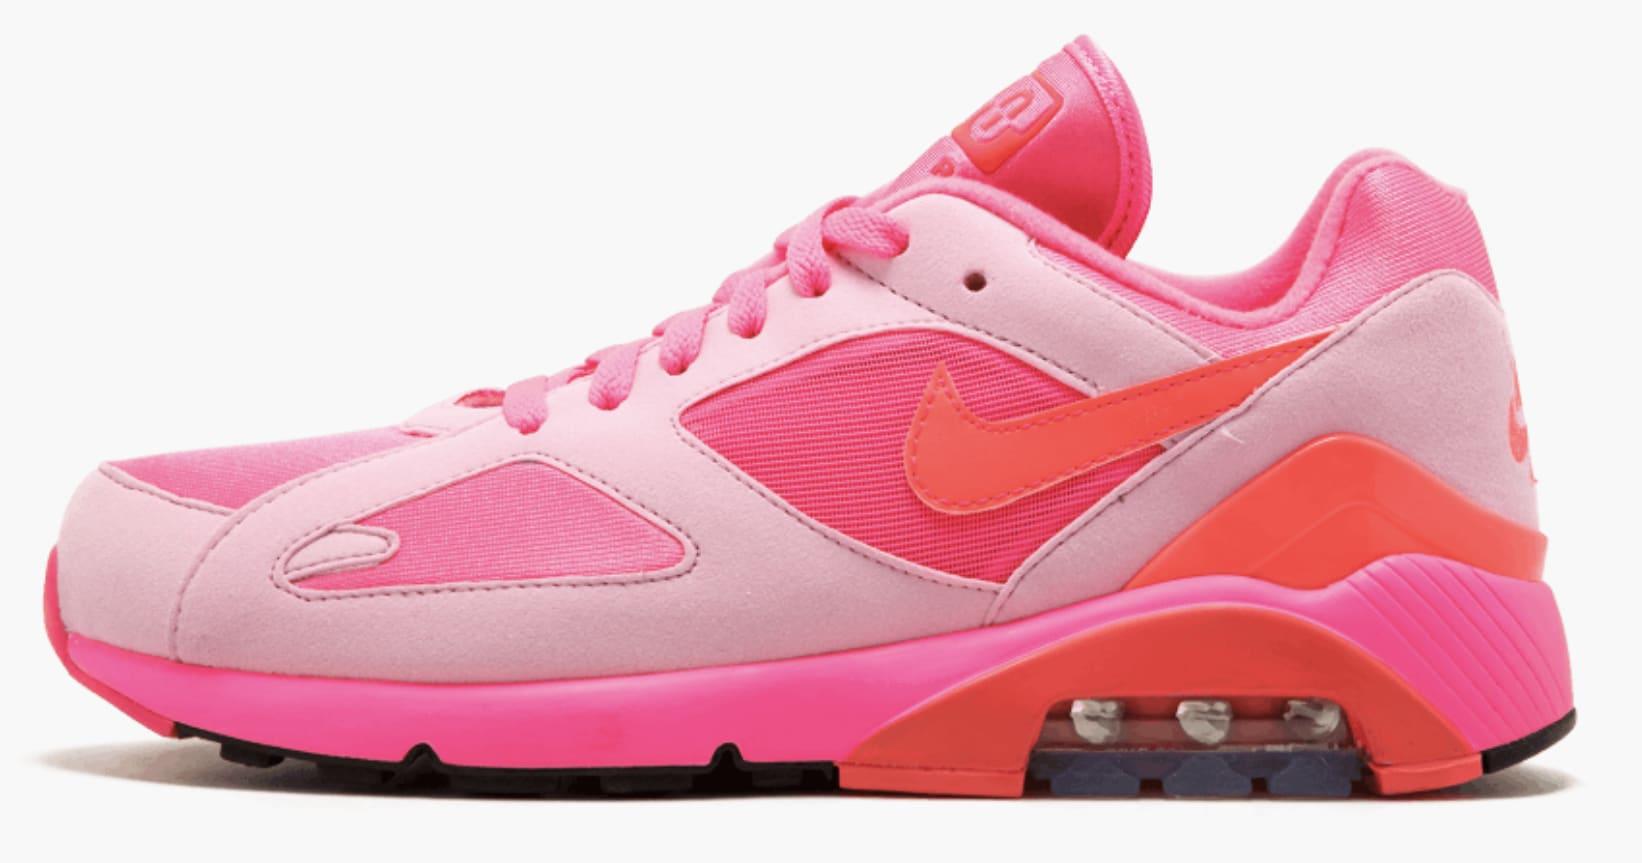 Comme des Garçons x Nike Air Max 180 (Pink)